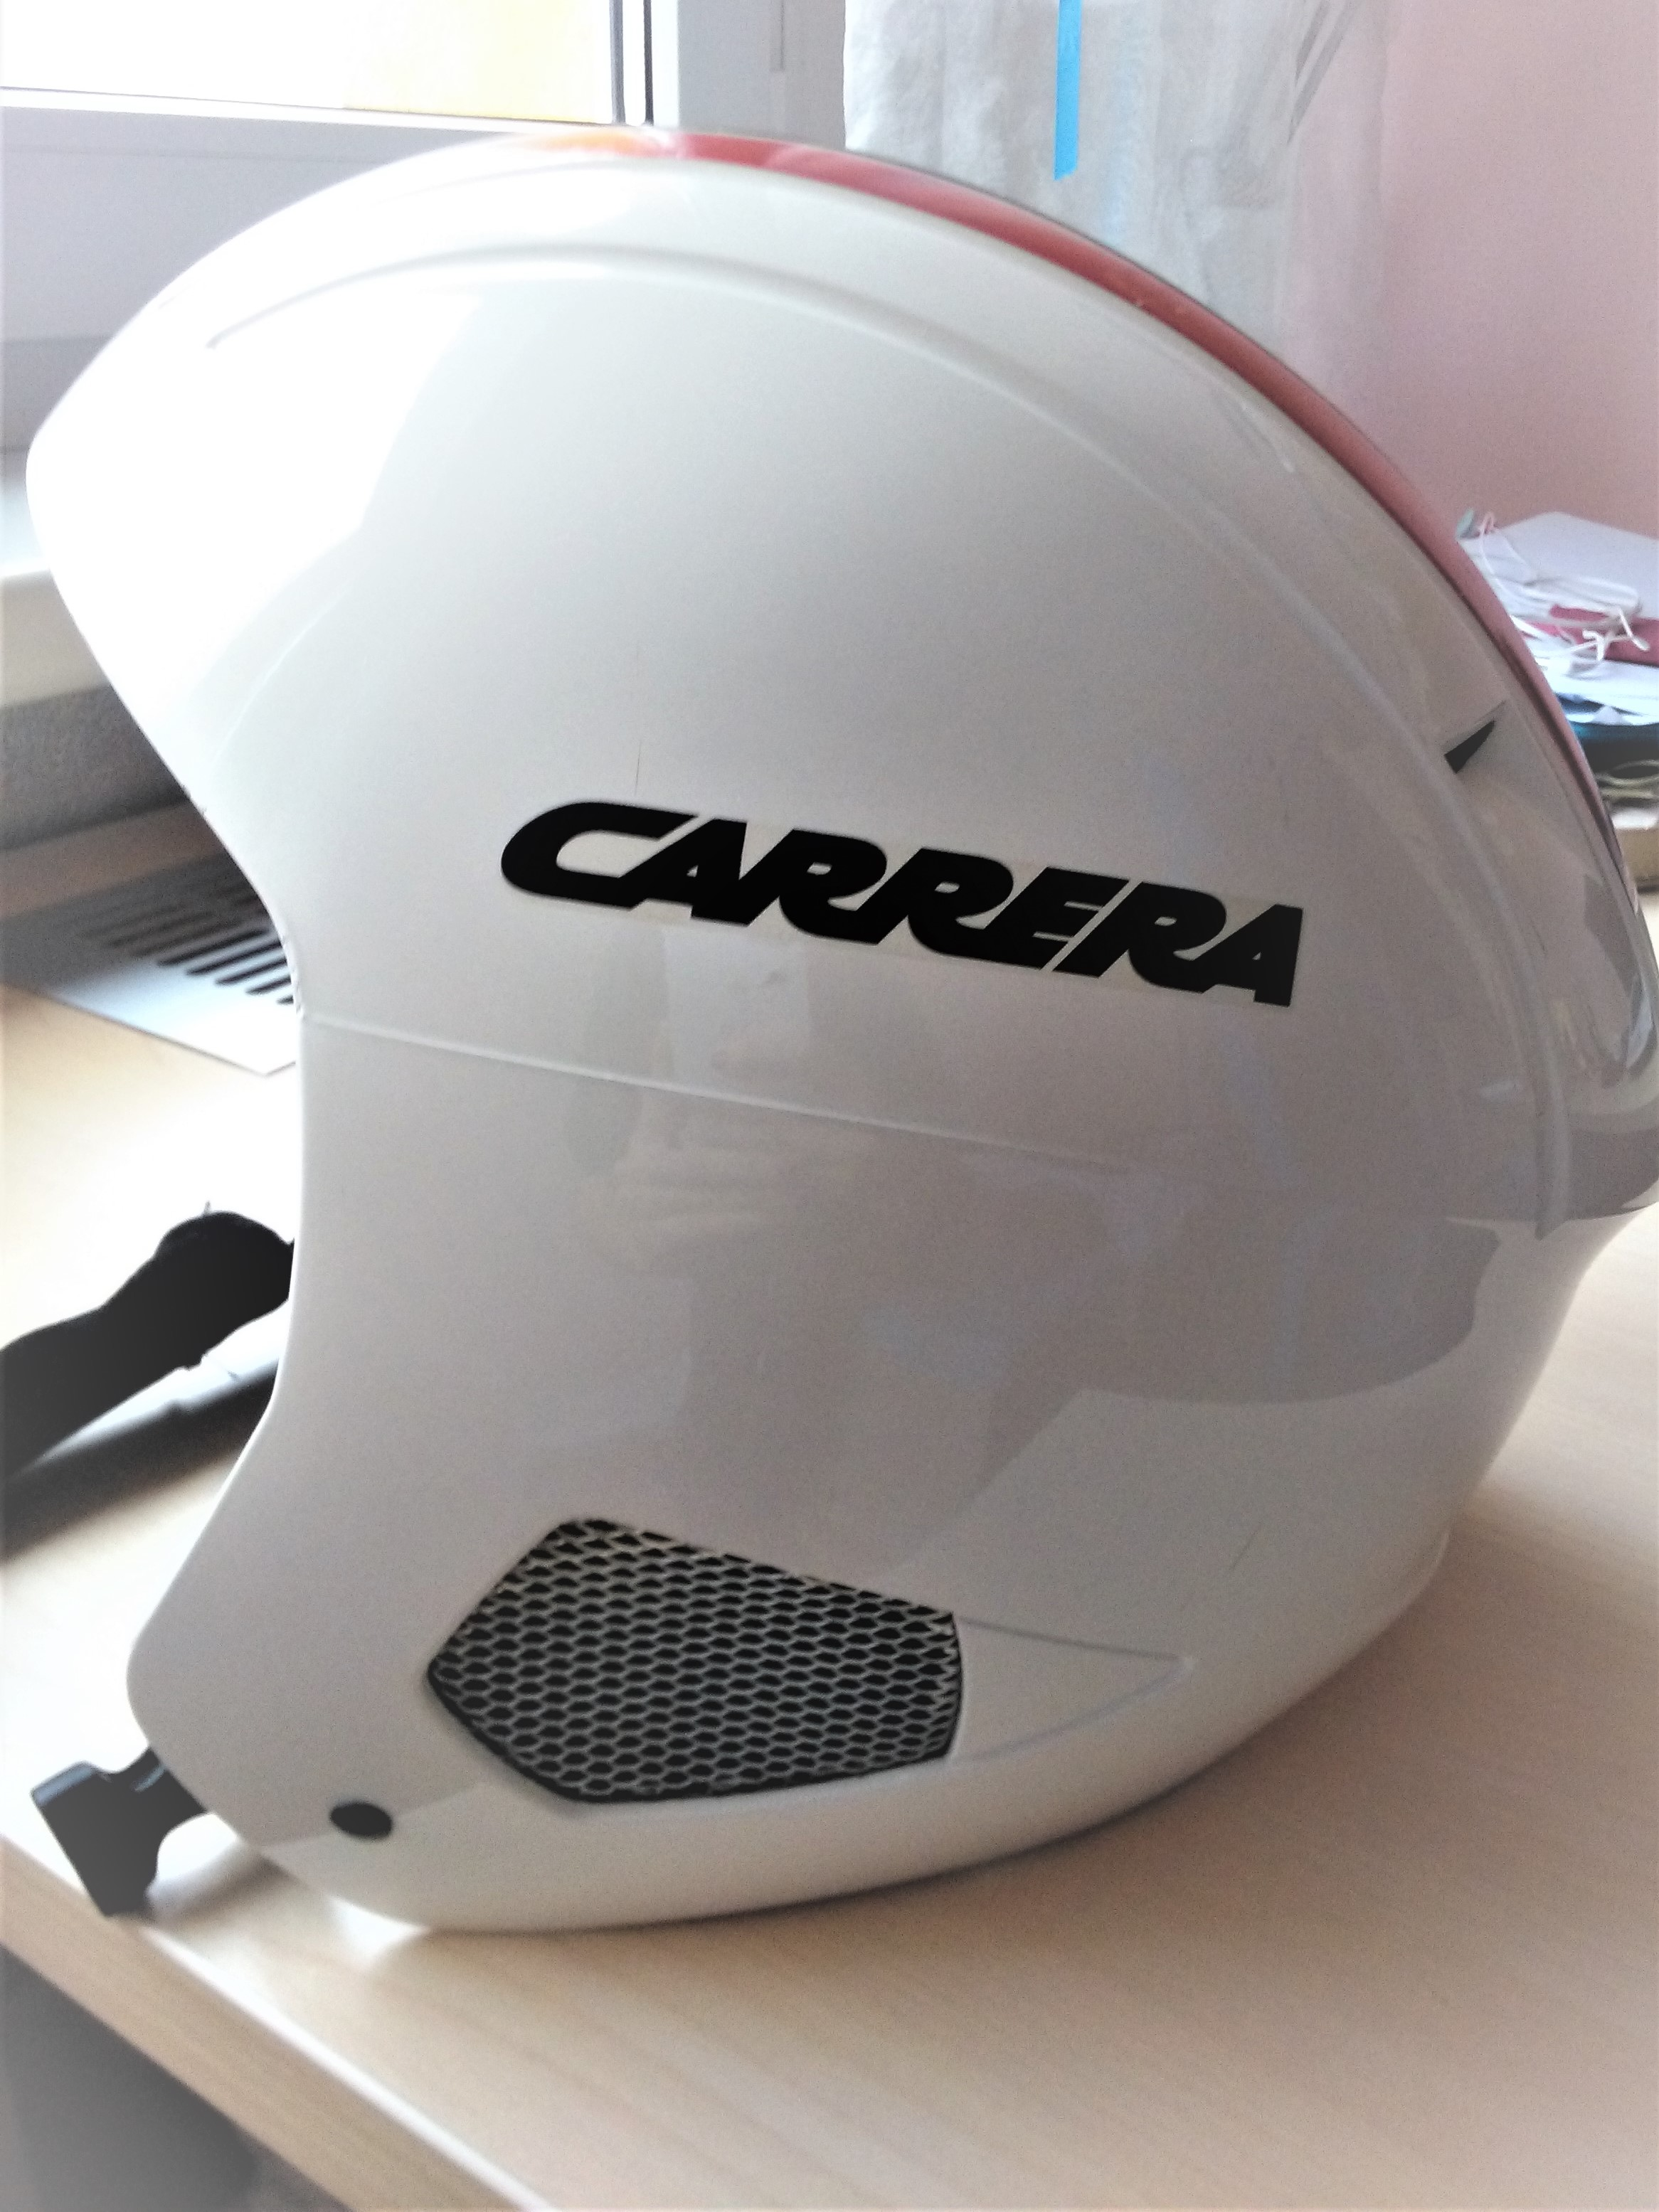 Dámská lyzařská helma - Carrera - Bazar - SNOW.CZ a2434d98516